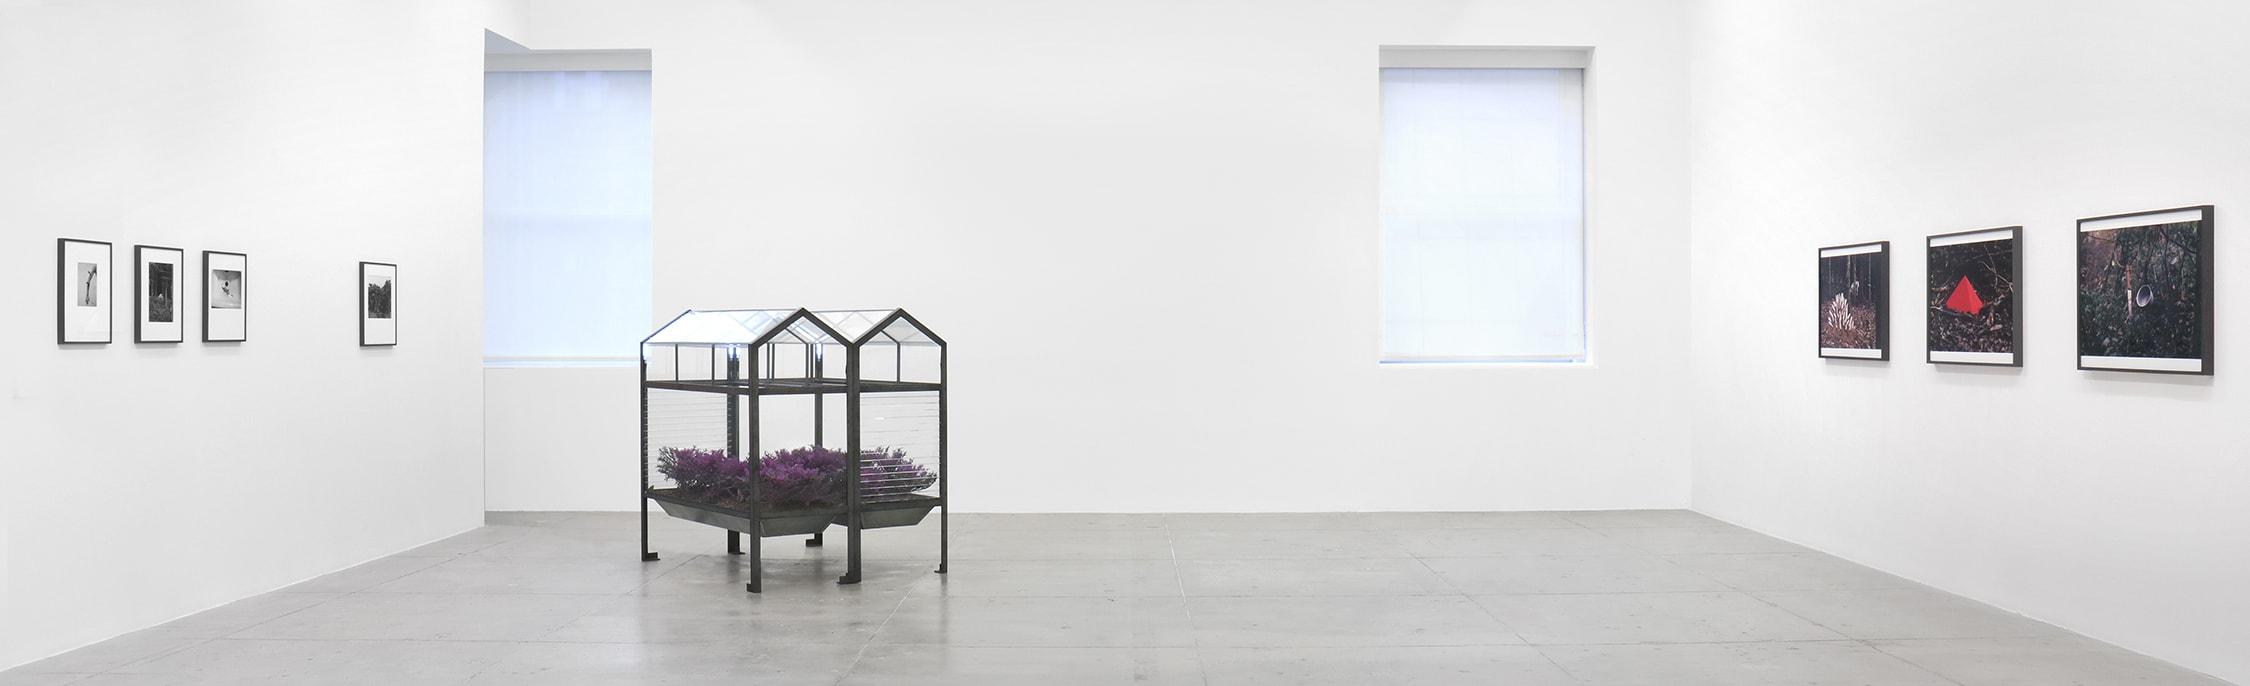 a series of photographs by  Lothar Baumgarten at Marian Goodman Gallery New York